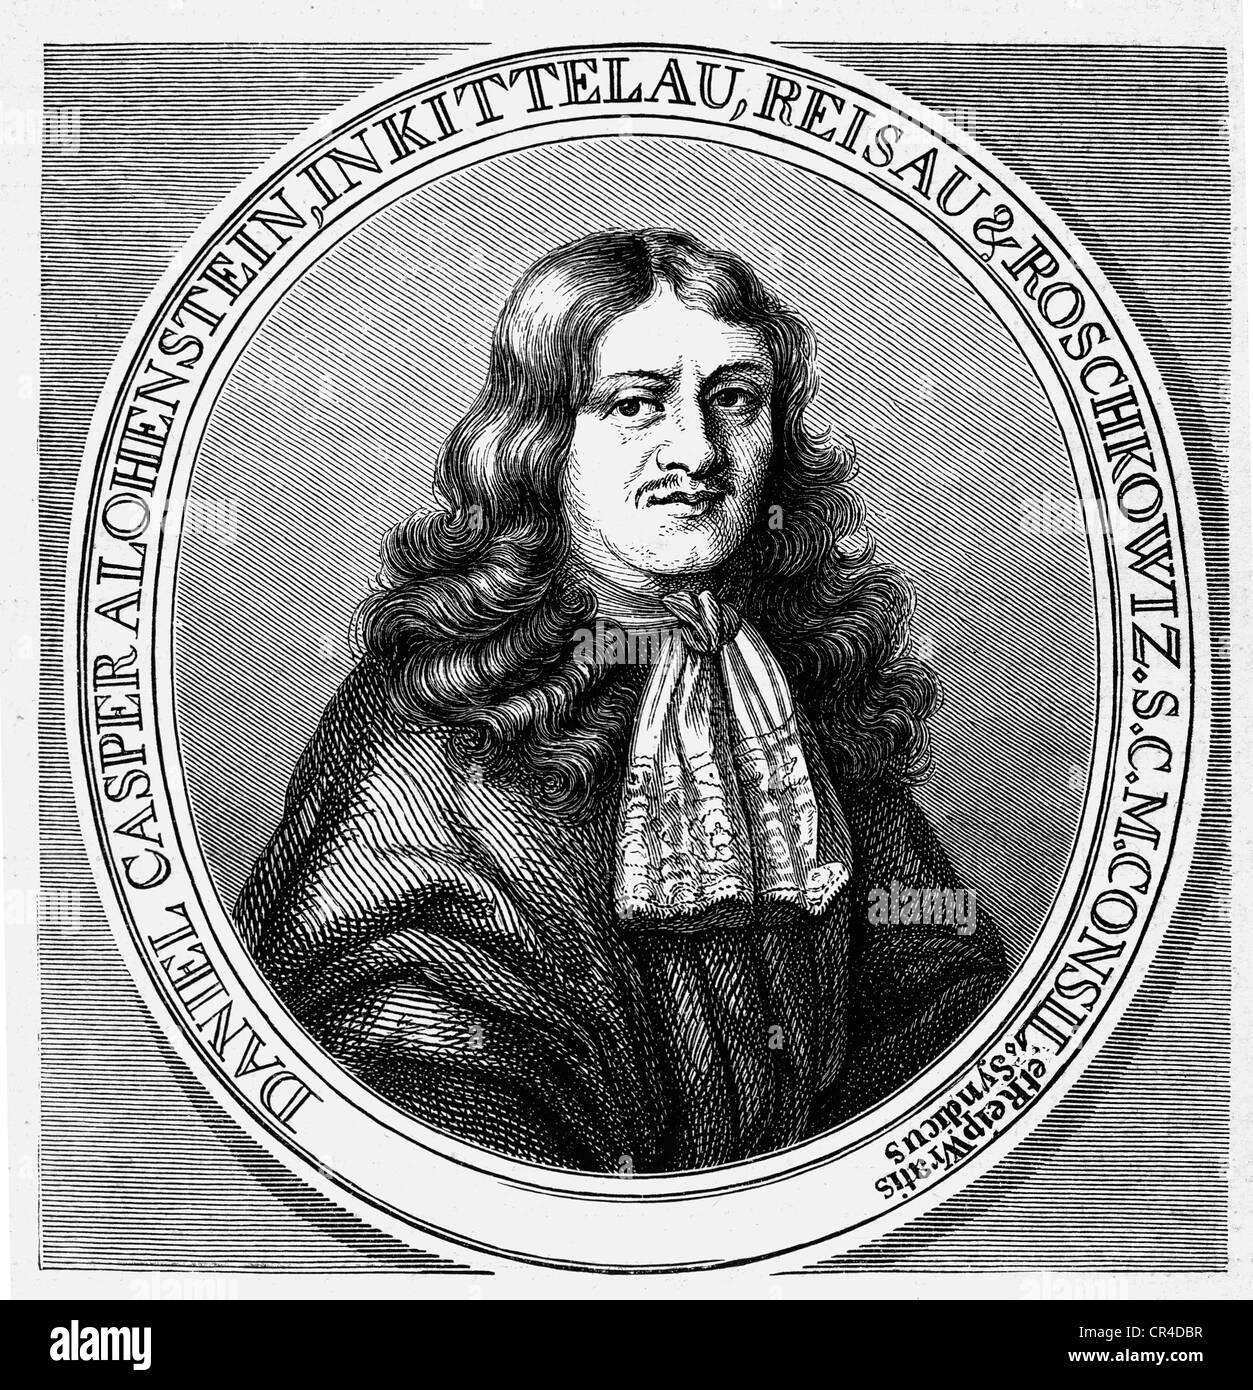 Daniel Casper von Lohenstein (1635-1683), jurist, dioelomat and poet - Stock Image